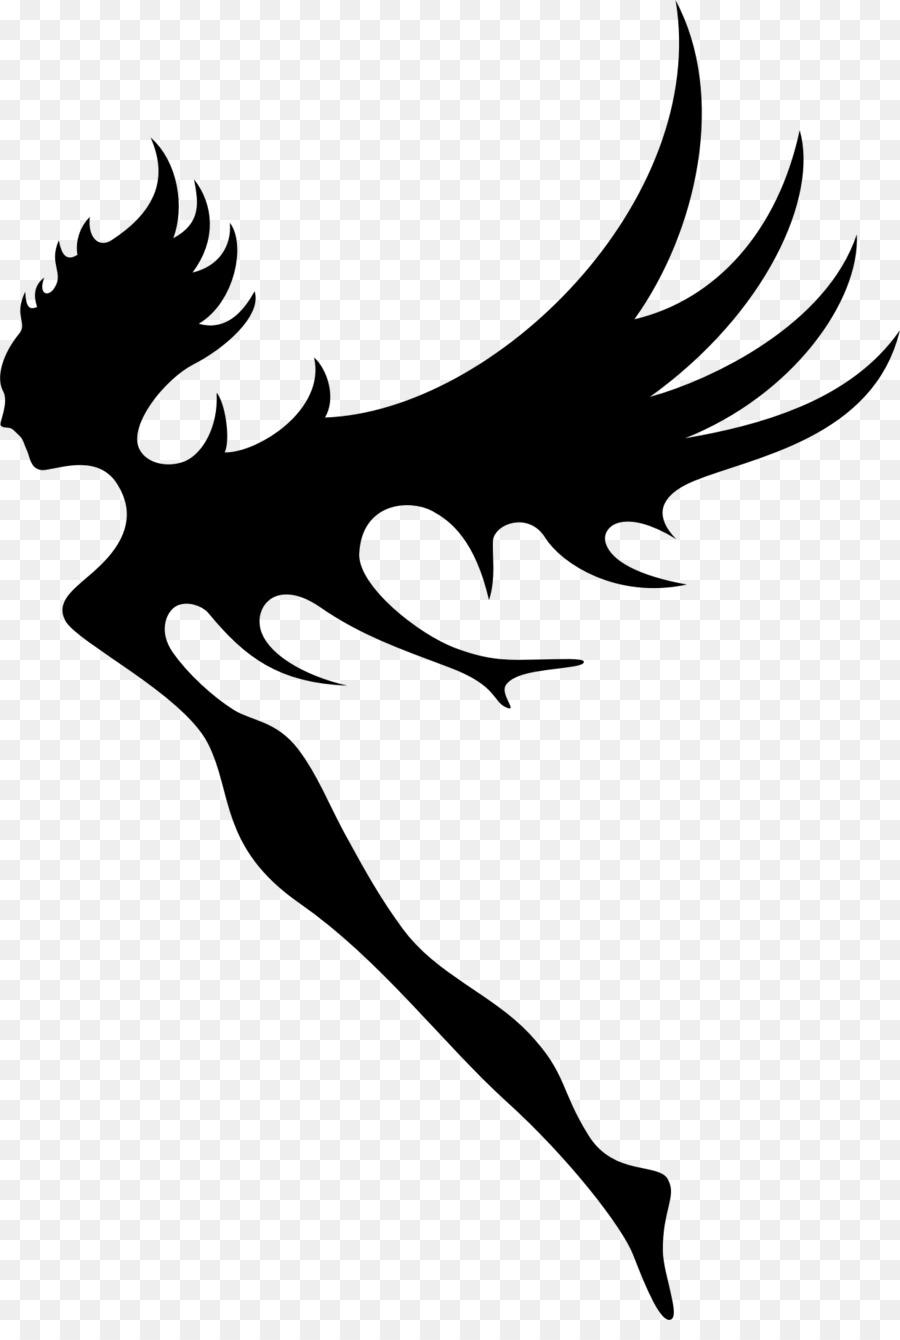 Pixie silhouette clipart banner library library Elf Cartoon clipart - Fairy, Hand, Bird, transparent clip art banner library library